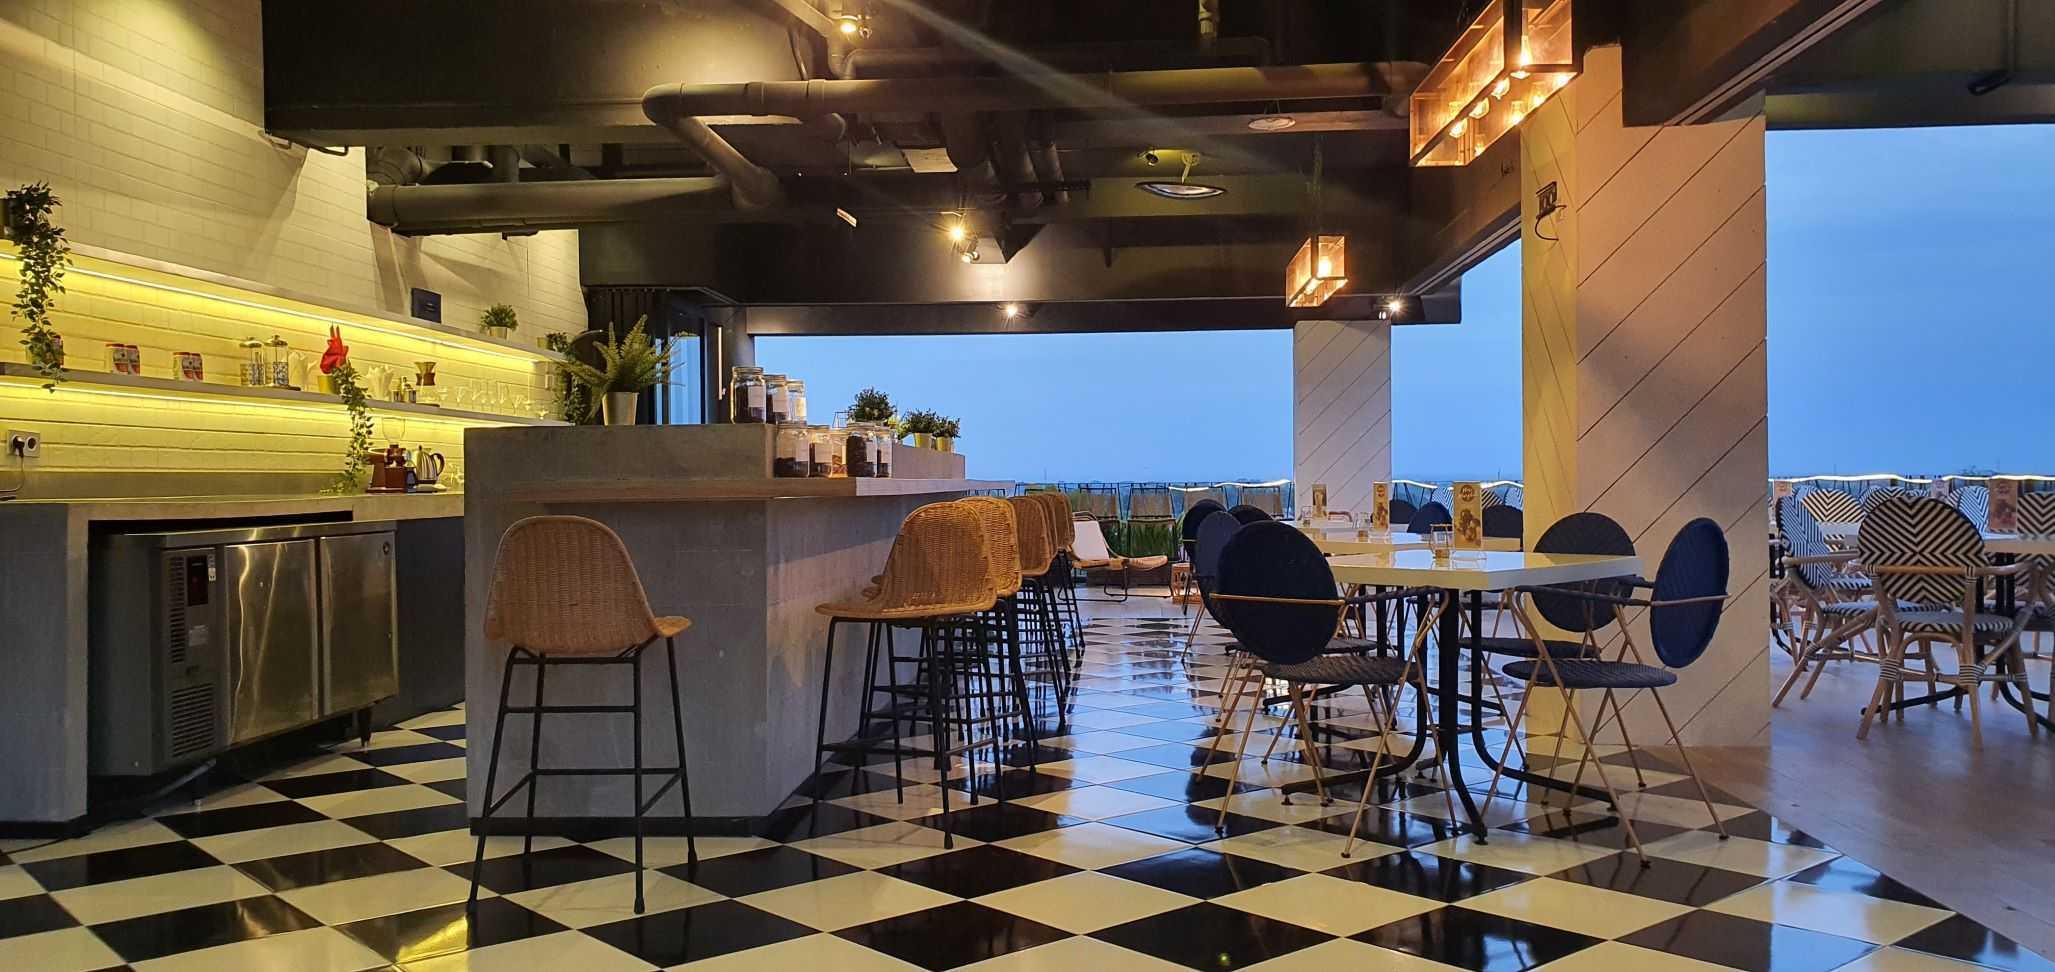 Pt Artindo Dreykarya Muda Pool Bar Prime Park Hotel Pekanbaru Pekanbaru, Kota Pekanbaru, Riau, Indonesia Pekanbaru, Kota Pekanbaru, Riau, Indonesia Pt-Artindo-Dreykarya-Muda-Pool-Bar-Prime-Park-Hotel-Pekanbaru  93998